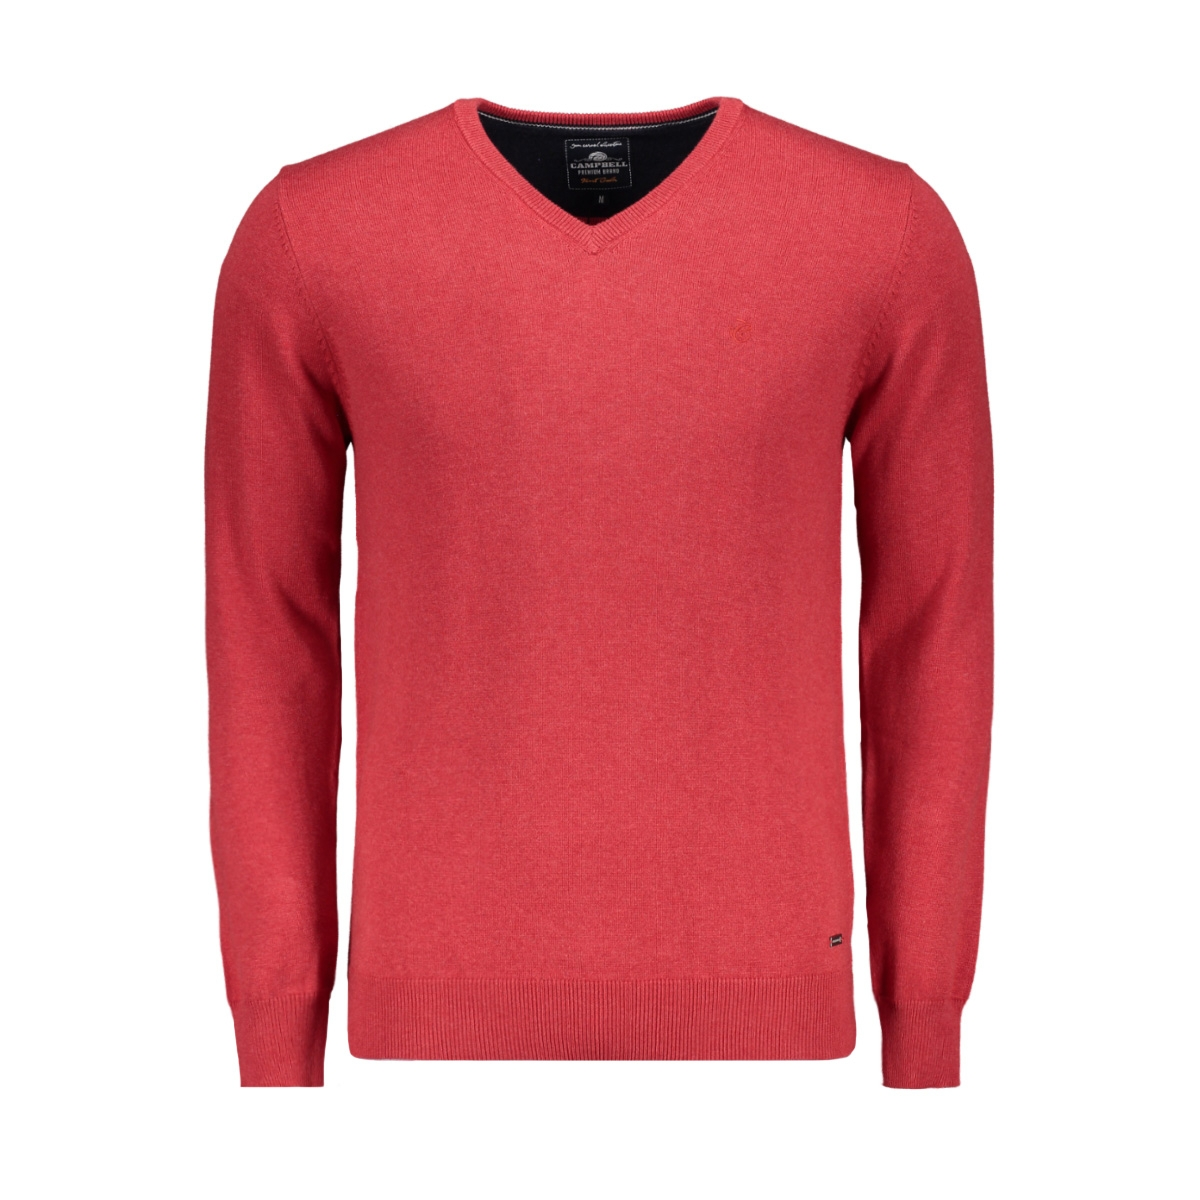 classic knitwear 052965 campbell trui 006 donkerrood uni